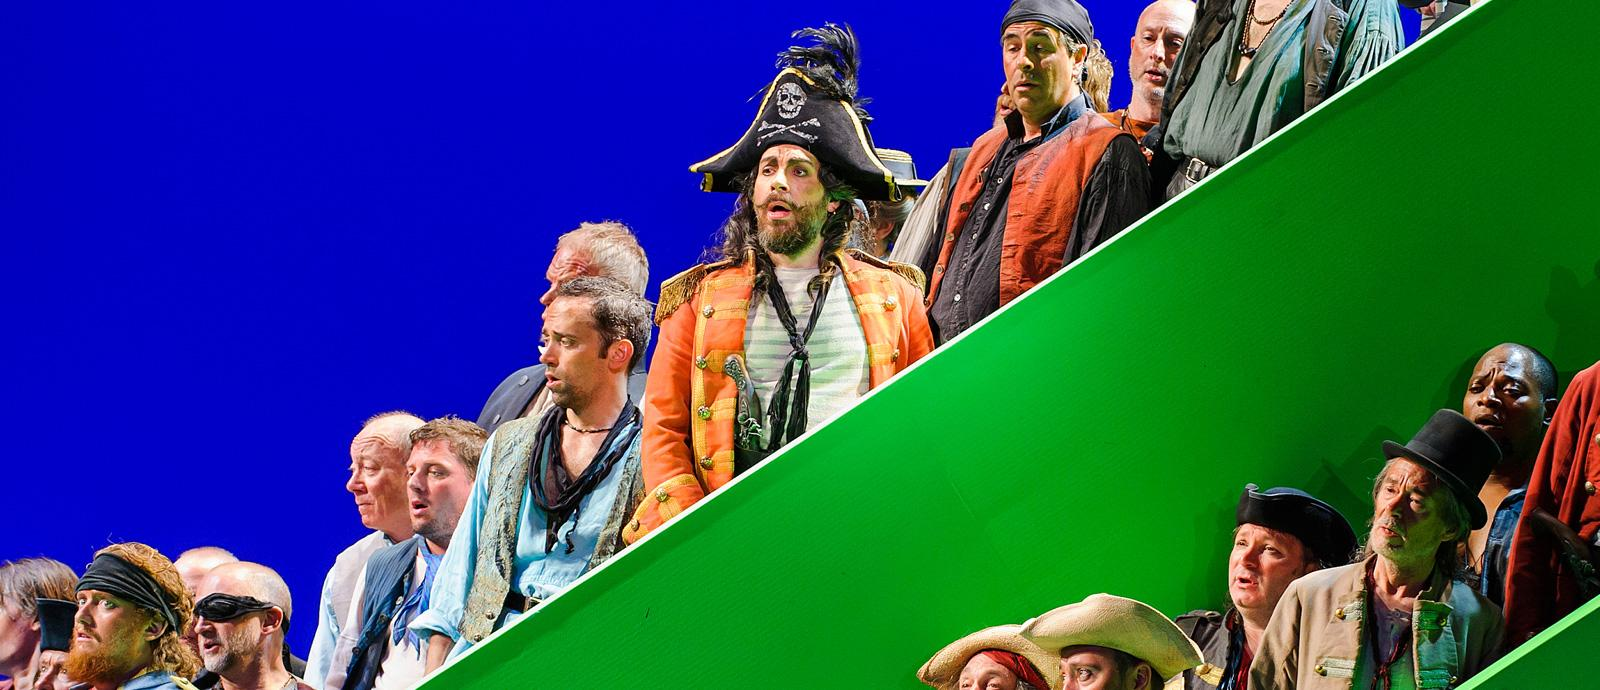 ENO's The Pirates of Penzance - Company. Photo by Tristram Kenton